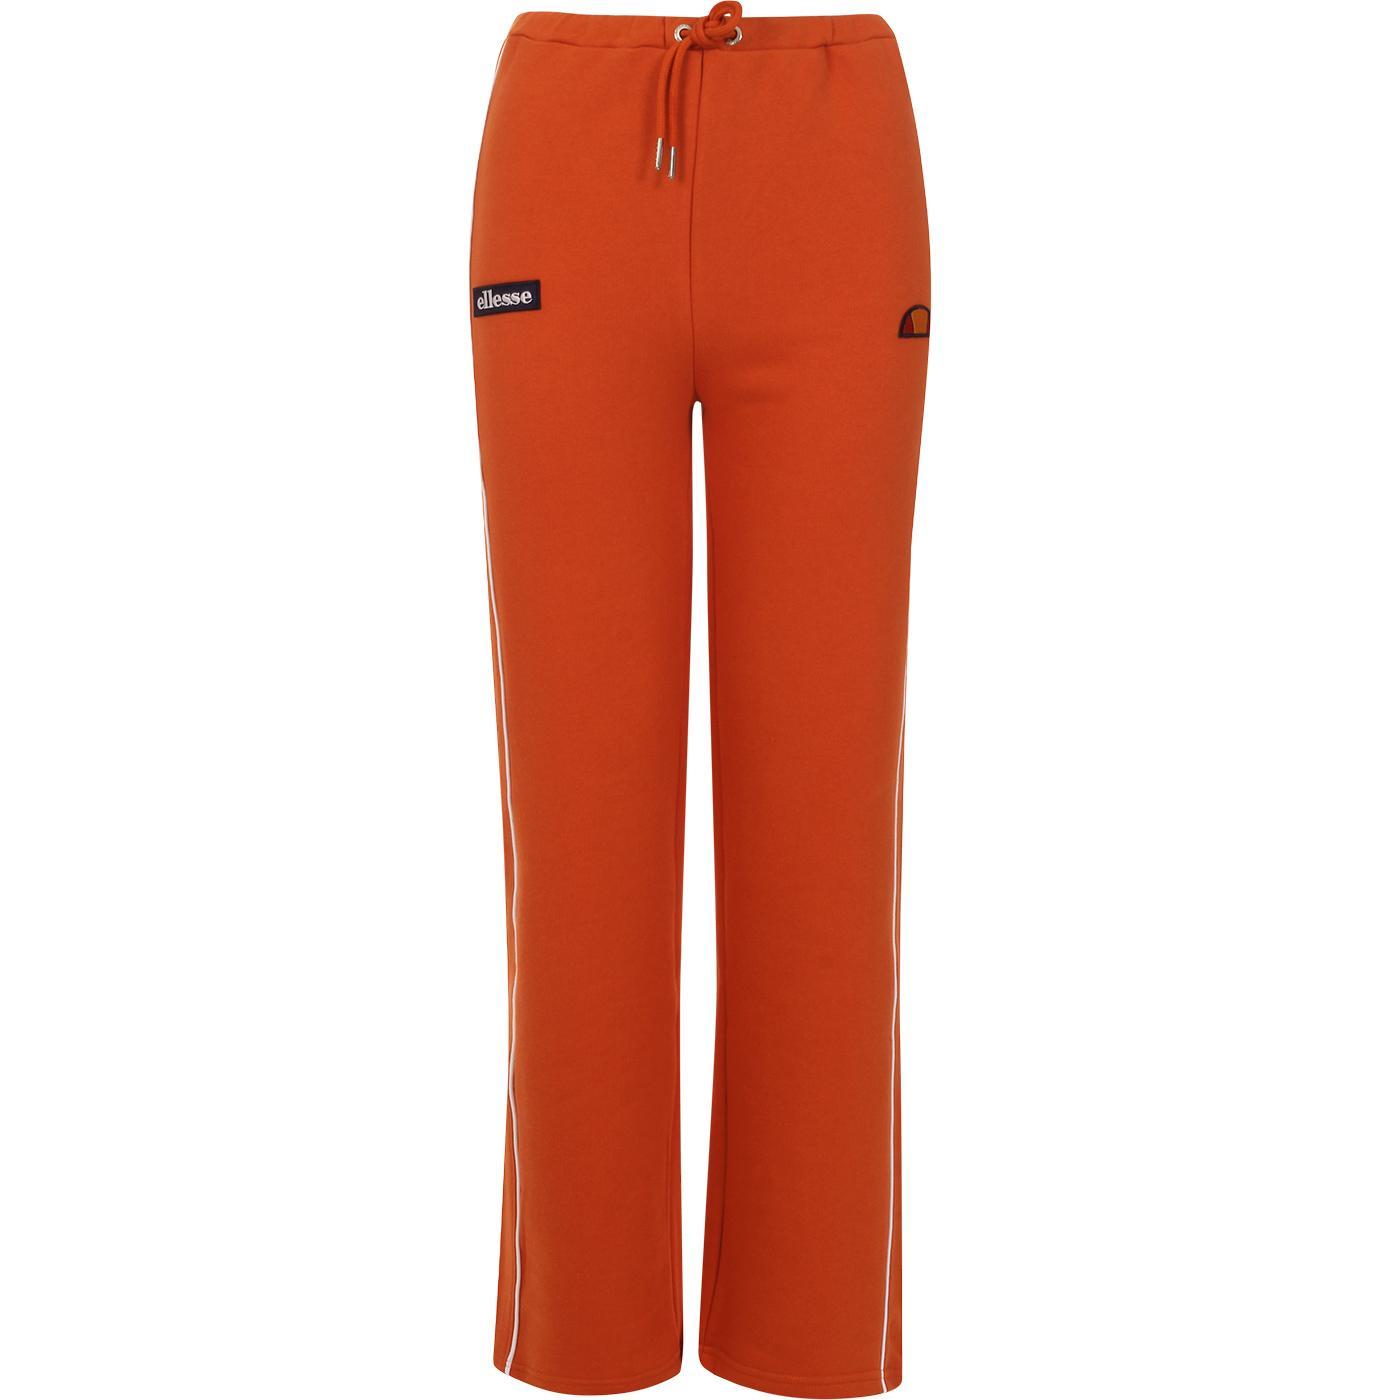 Amiti ELLESSE Womens Retro Jog Pants (Dark Orange)